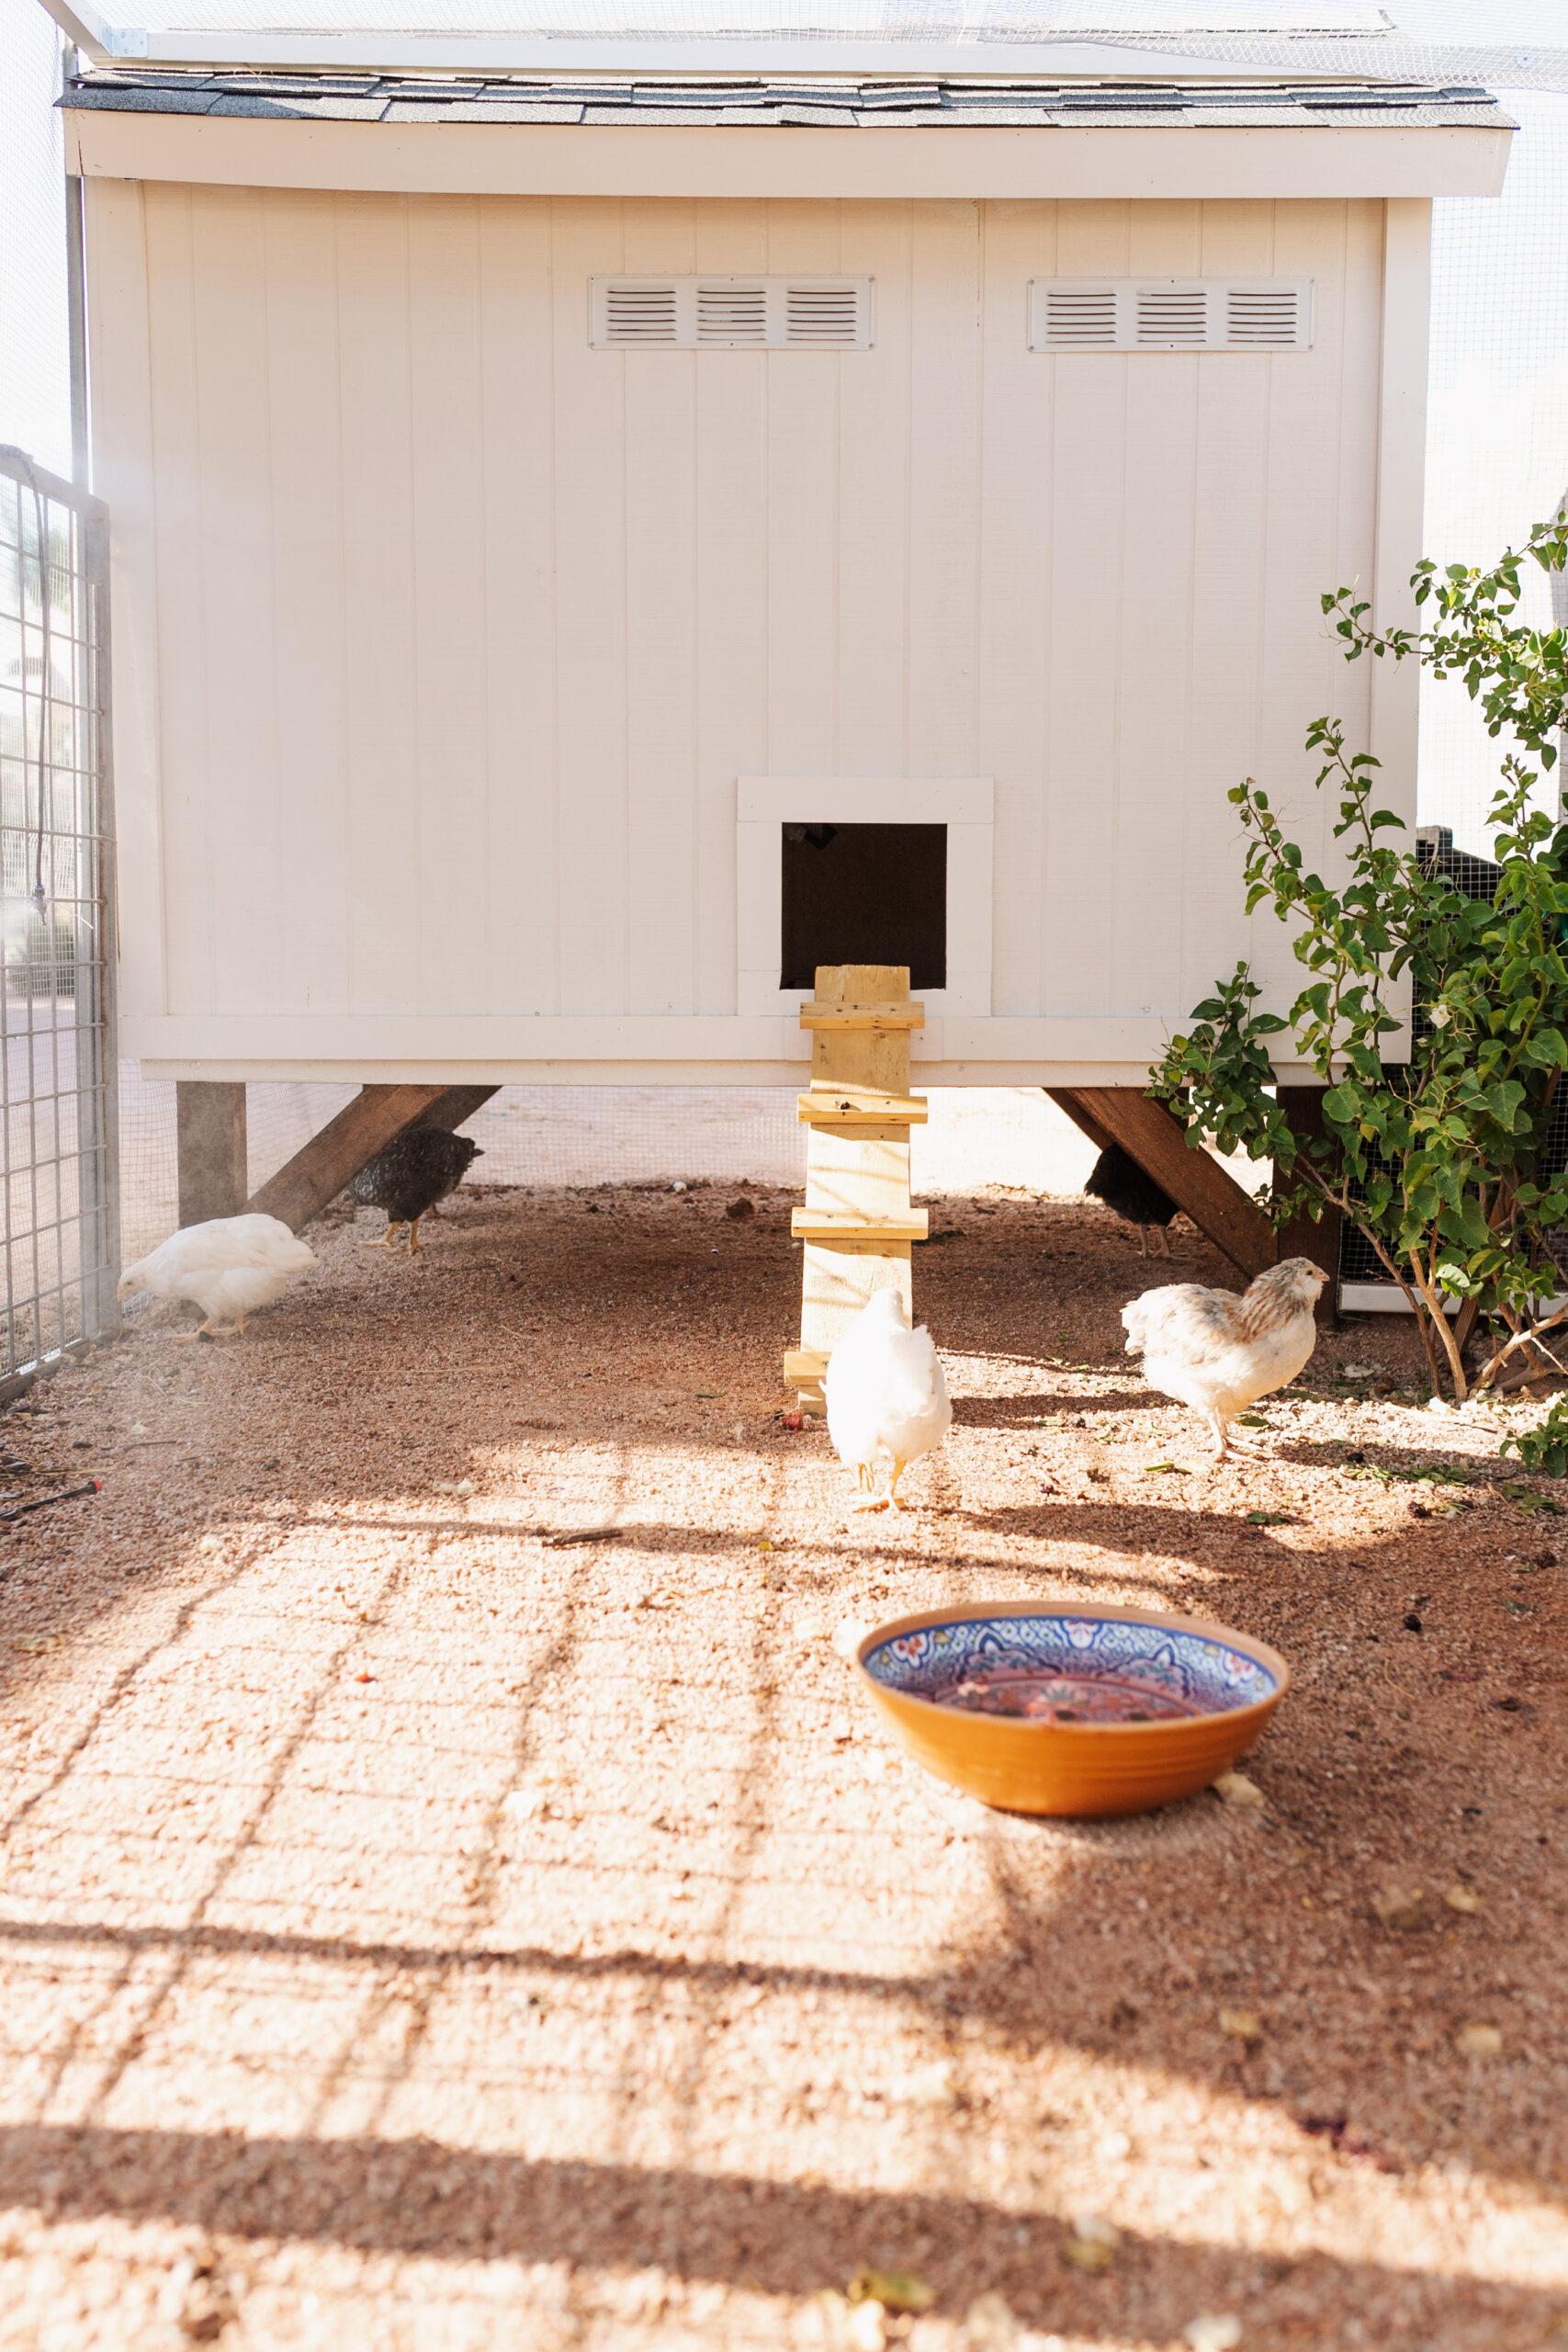 happy chickens in their new desert chicken coop and run #thelovedesignedlife #backyardchickens #raisingchickens #fresheggs